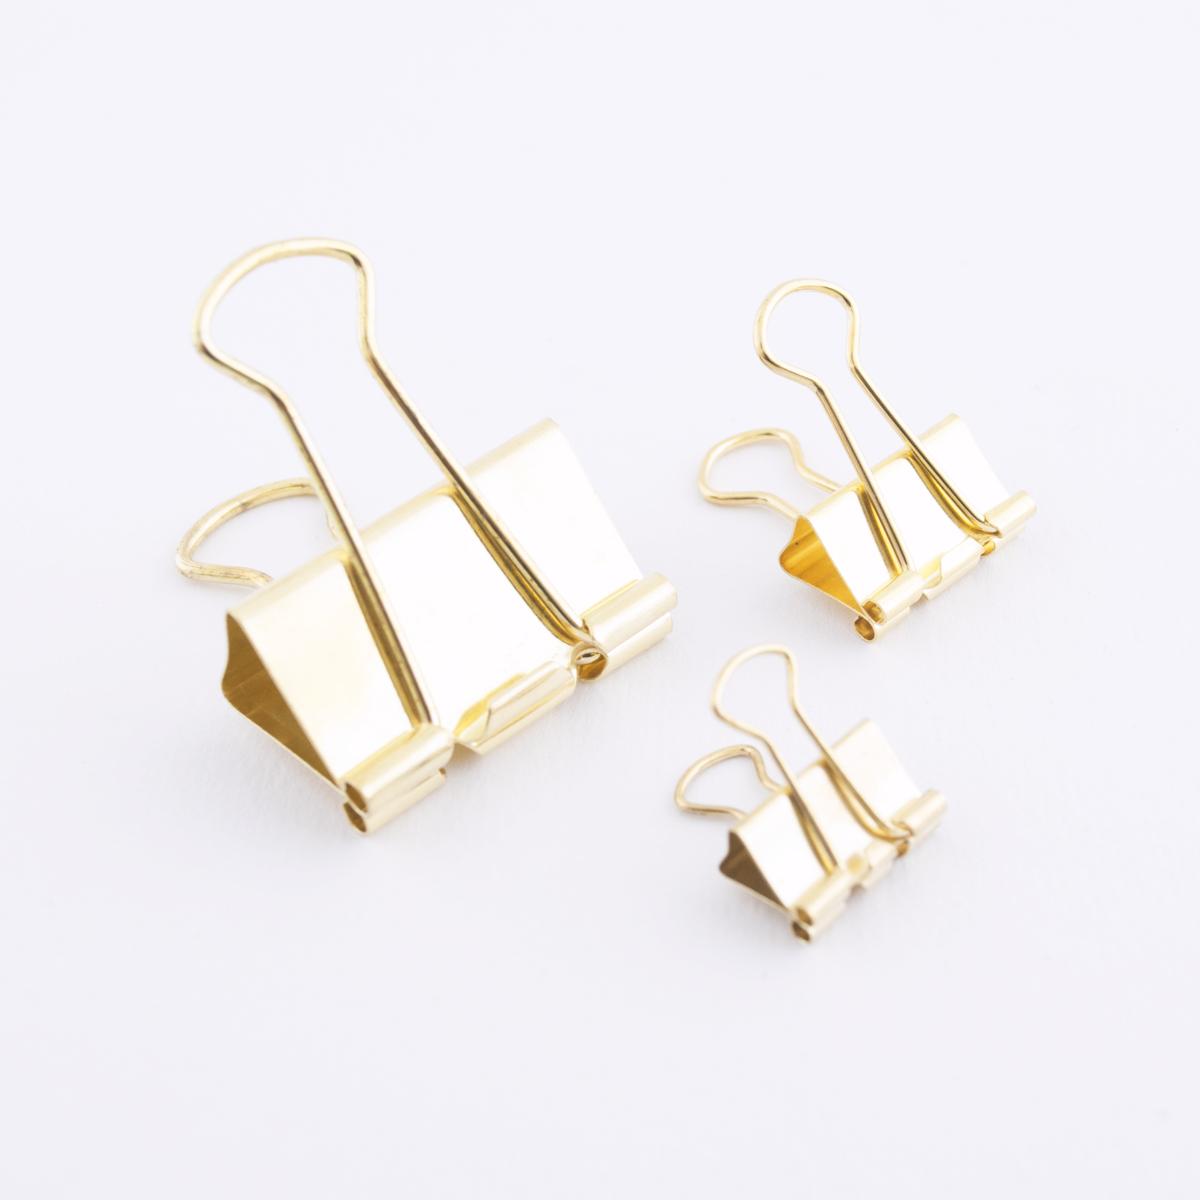 gold-binder-clip-3